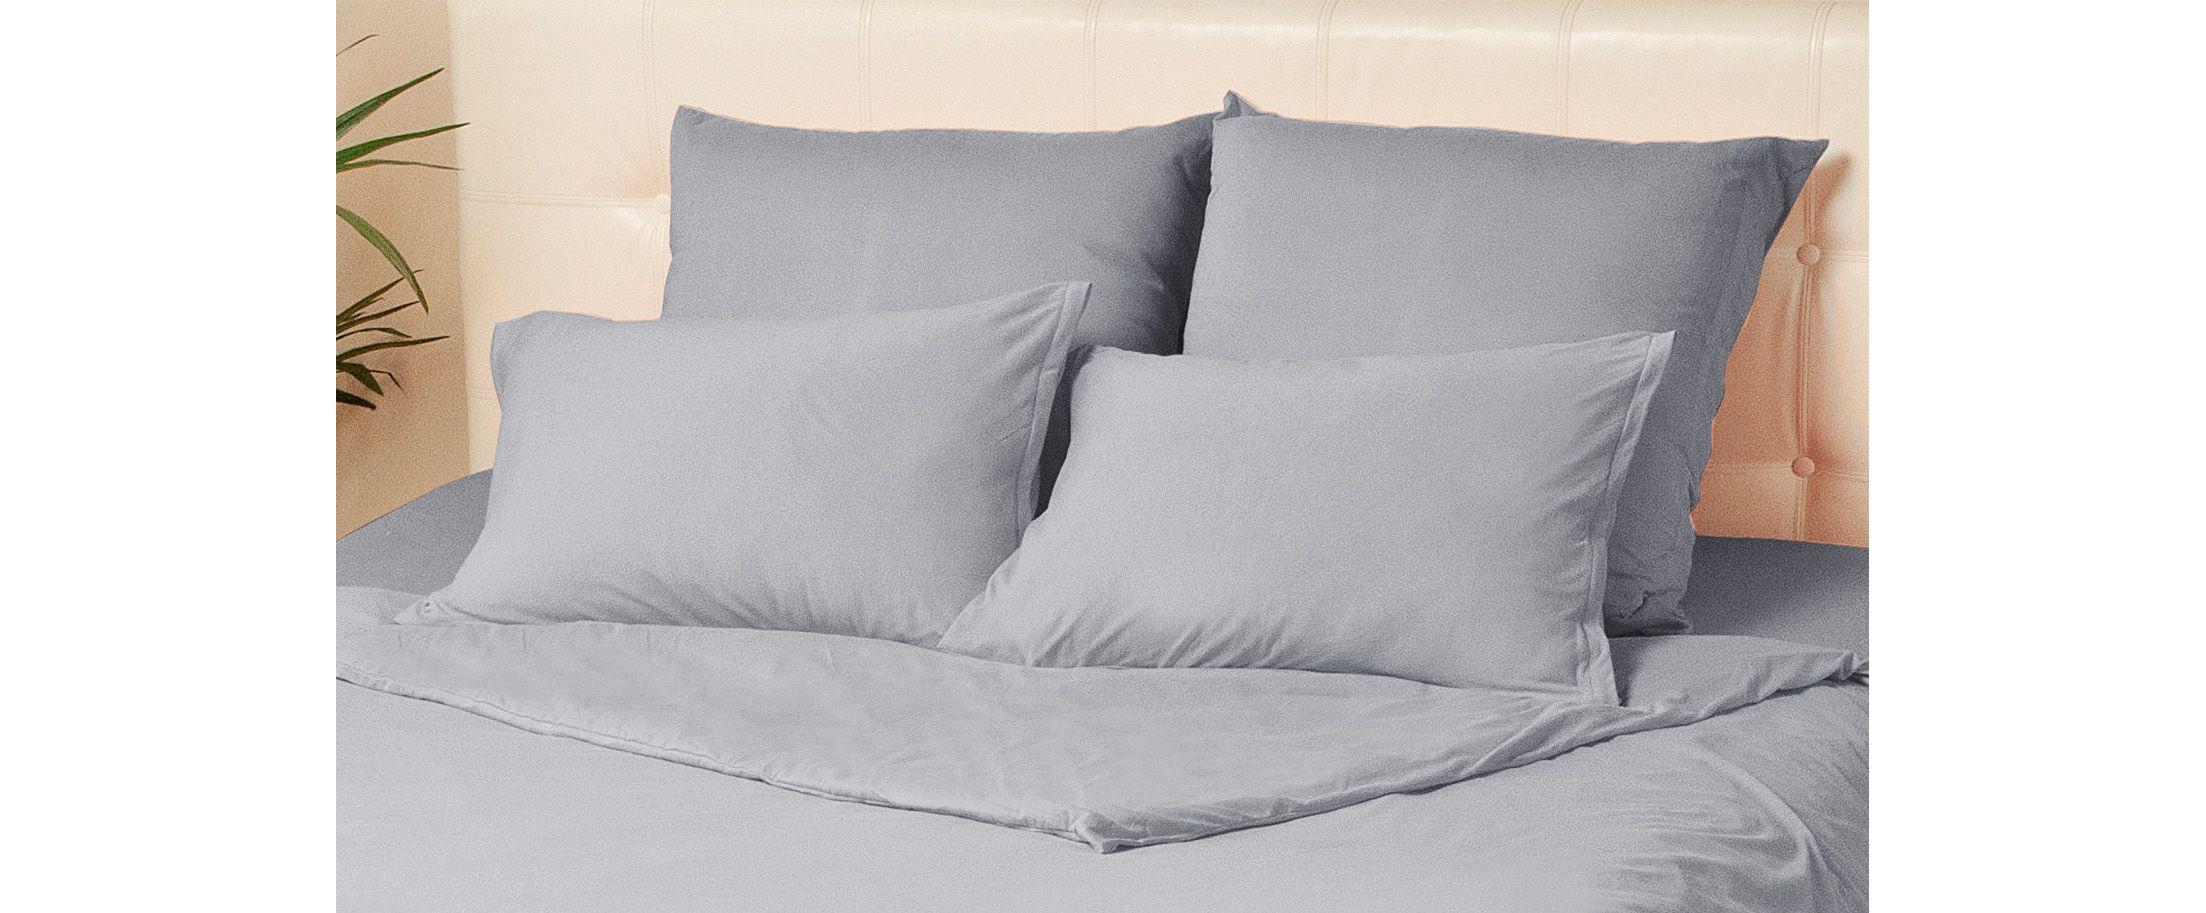 Комплект наволочек на молнии 50х70 цвета серый меланж Violett Модель 4002 от MOON TRADE